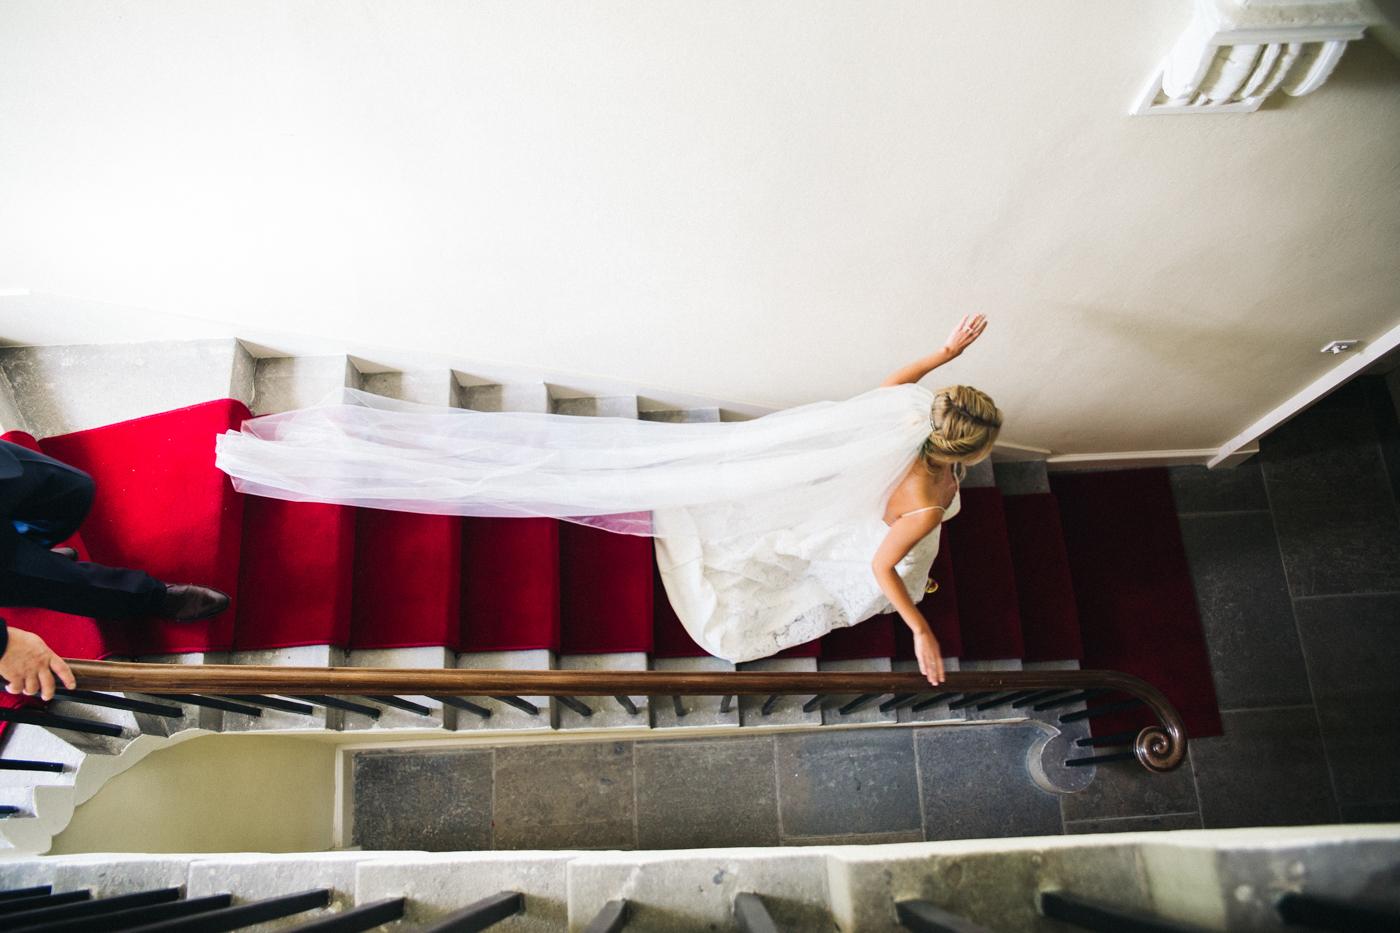 teesside-middlesbrough-north-east-wedding-photographer-creative-wedding-venues-0001.jpg